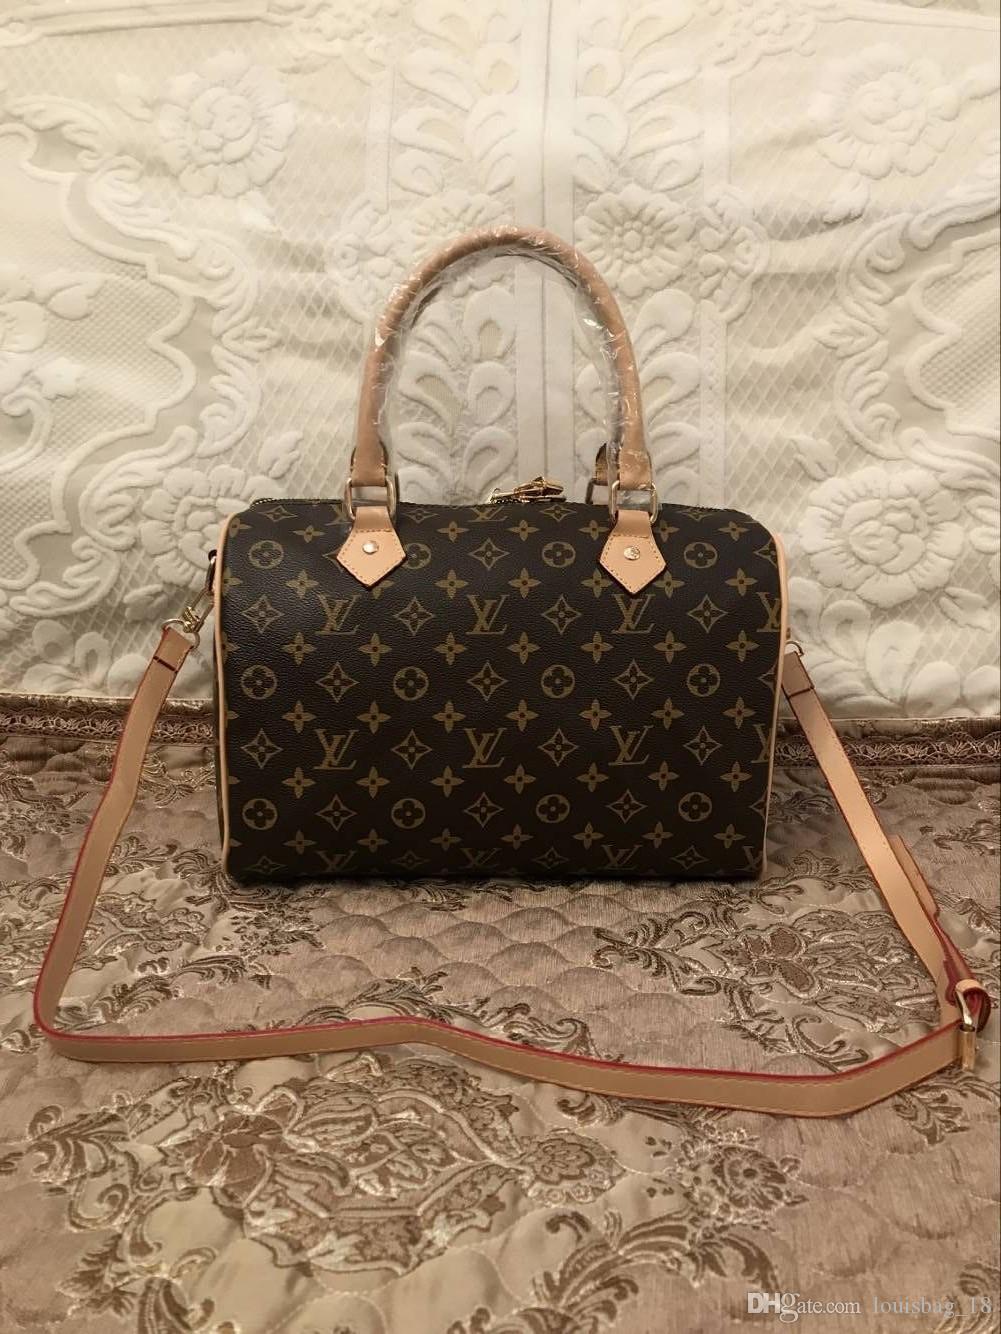 ARTSY Top quality brand new women European and american luxury lady real Leather handbag tote bag purse MetIS Designer SPEEDY v09